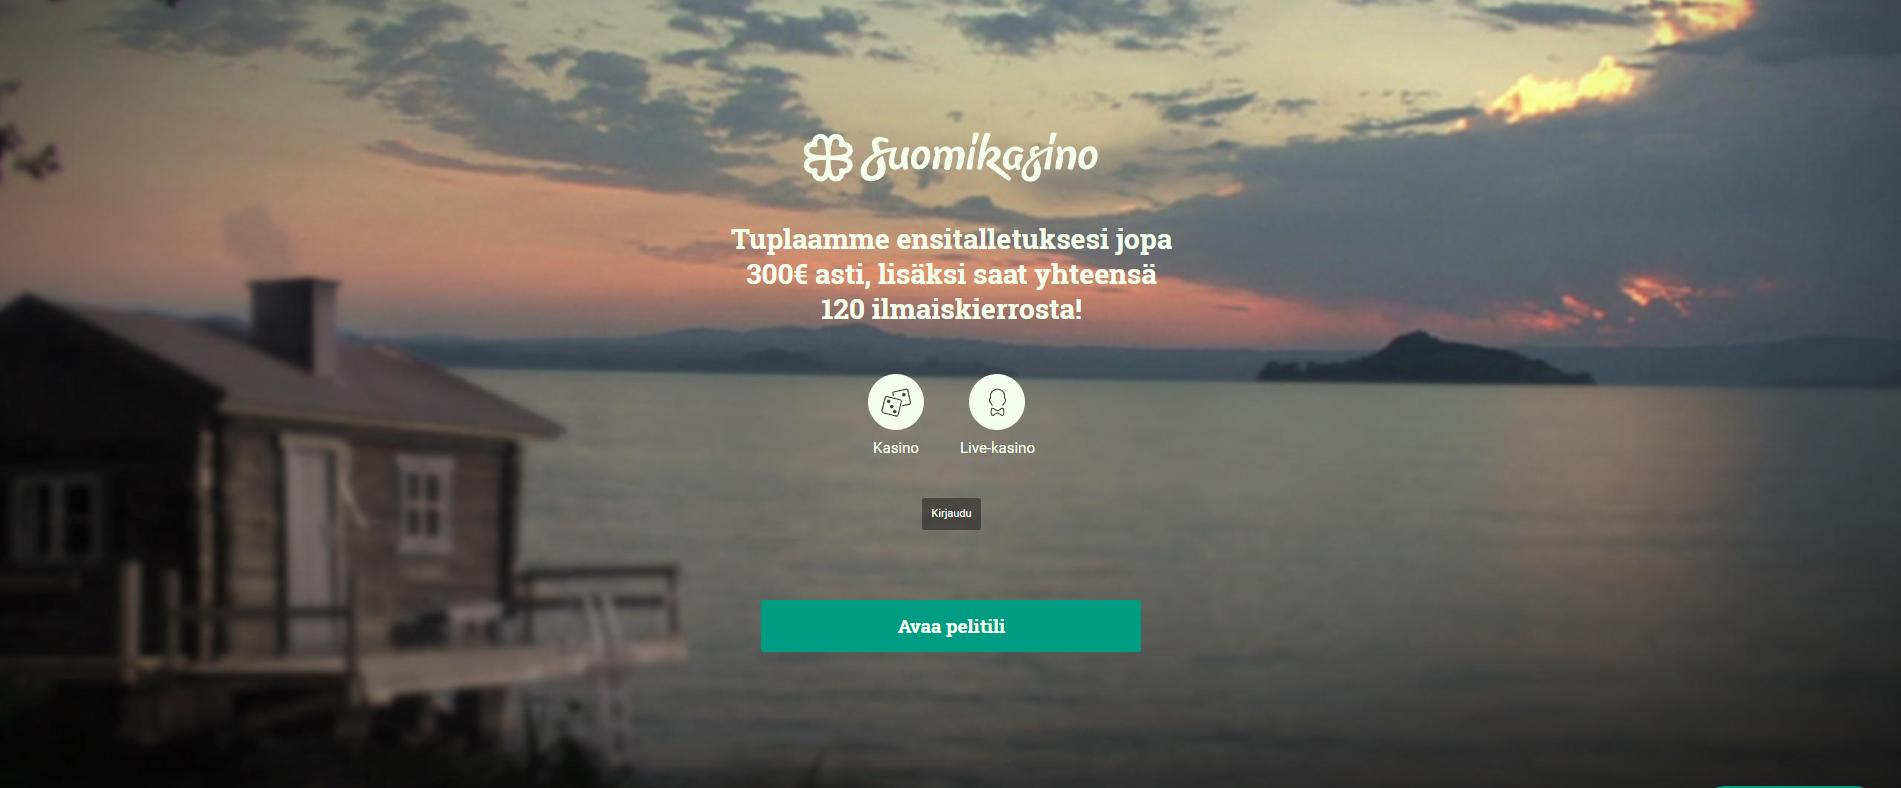 Suomikasino-Finland-Images1